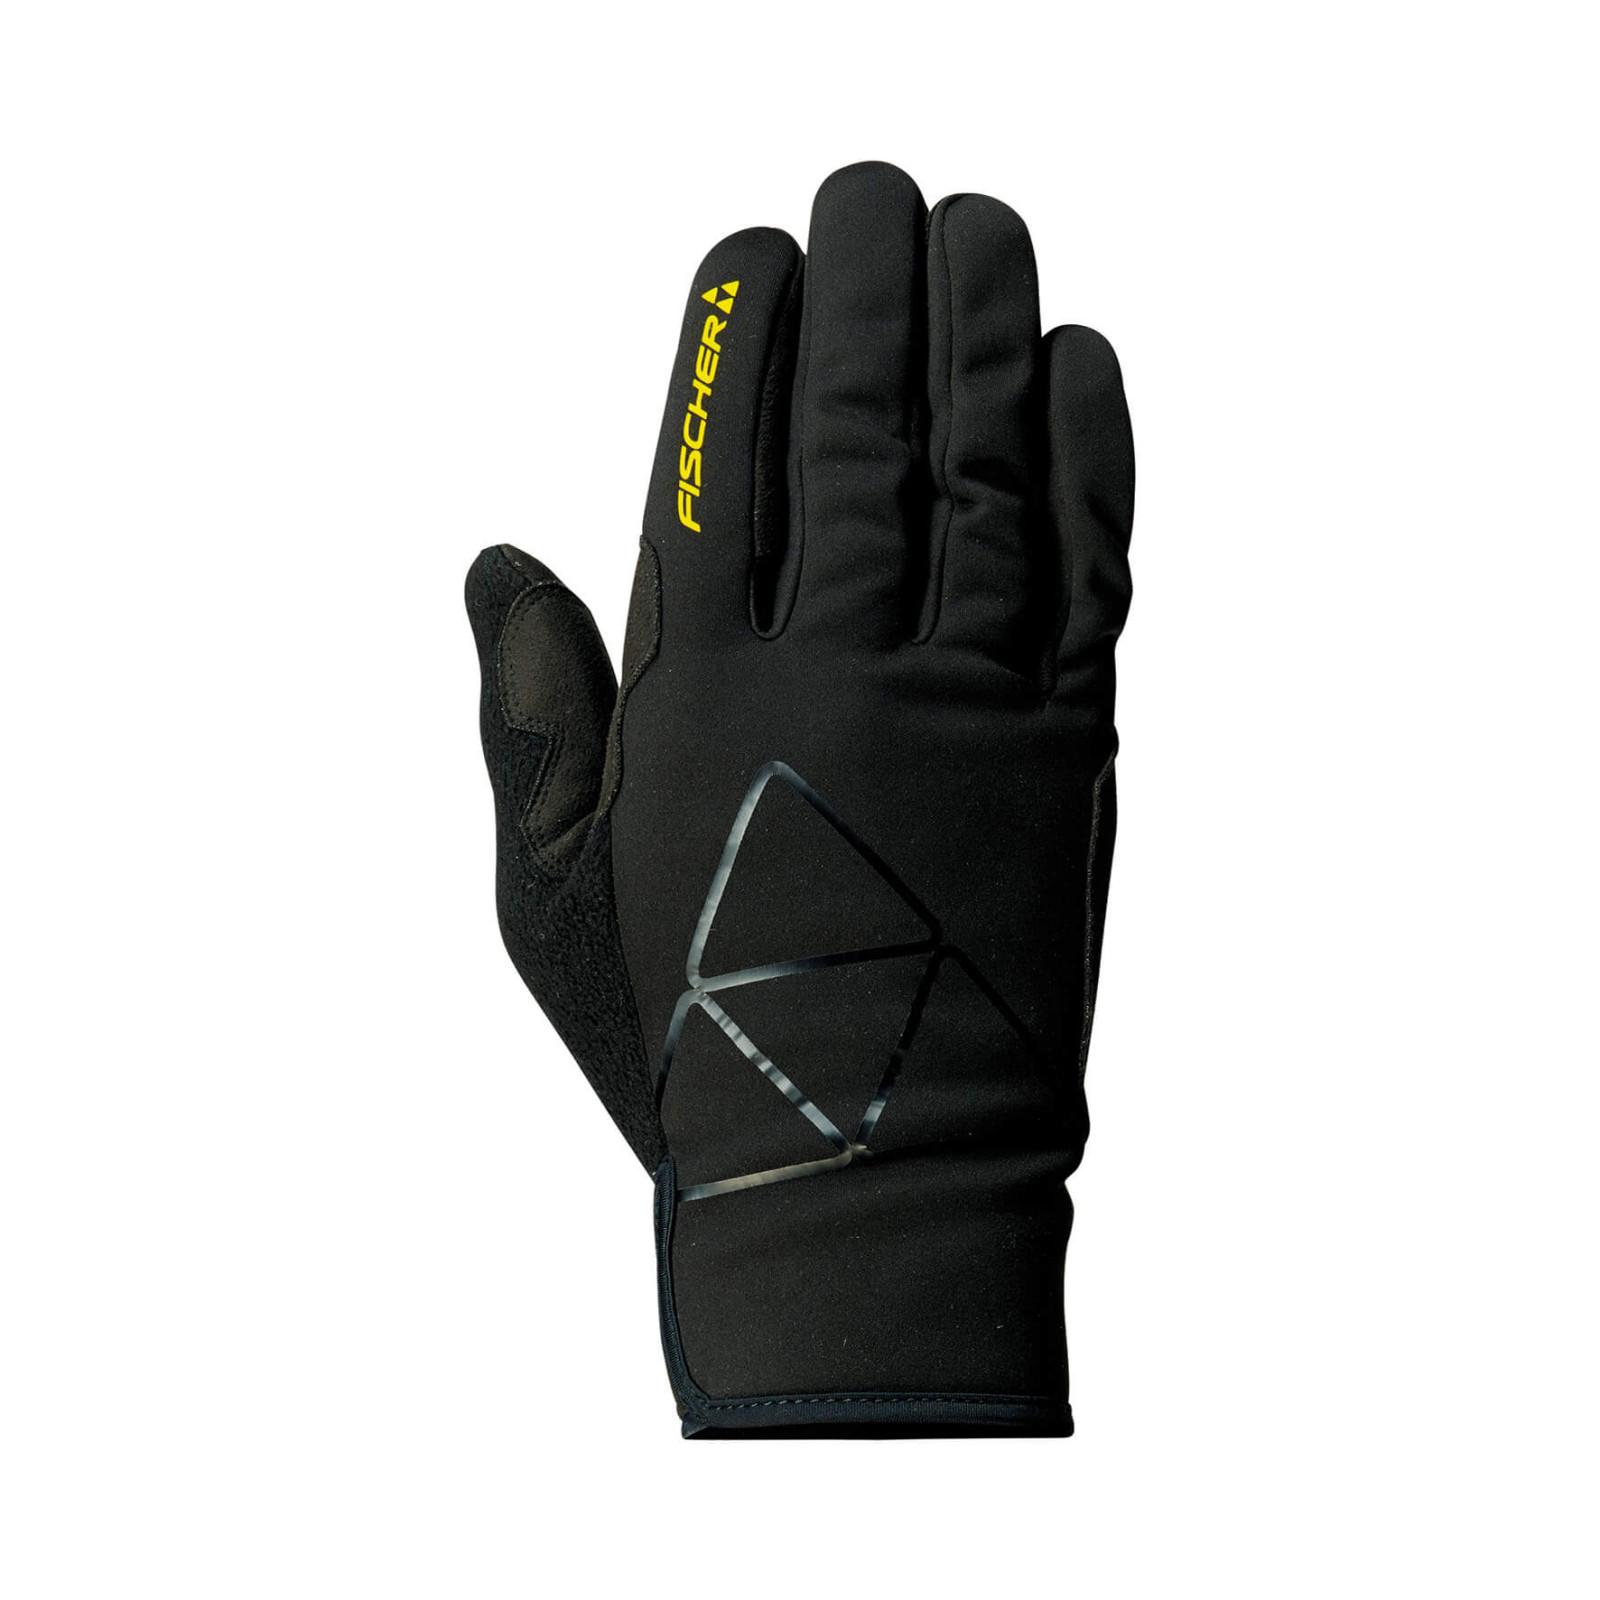 běžecké rukavice Fischer XC RACING PRO